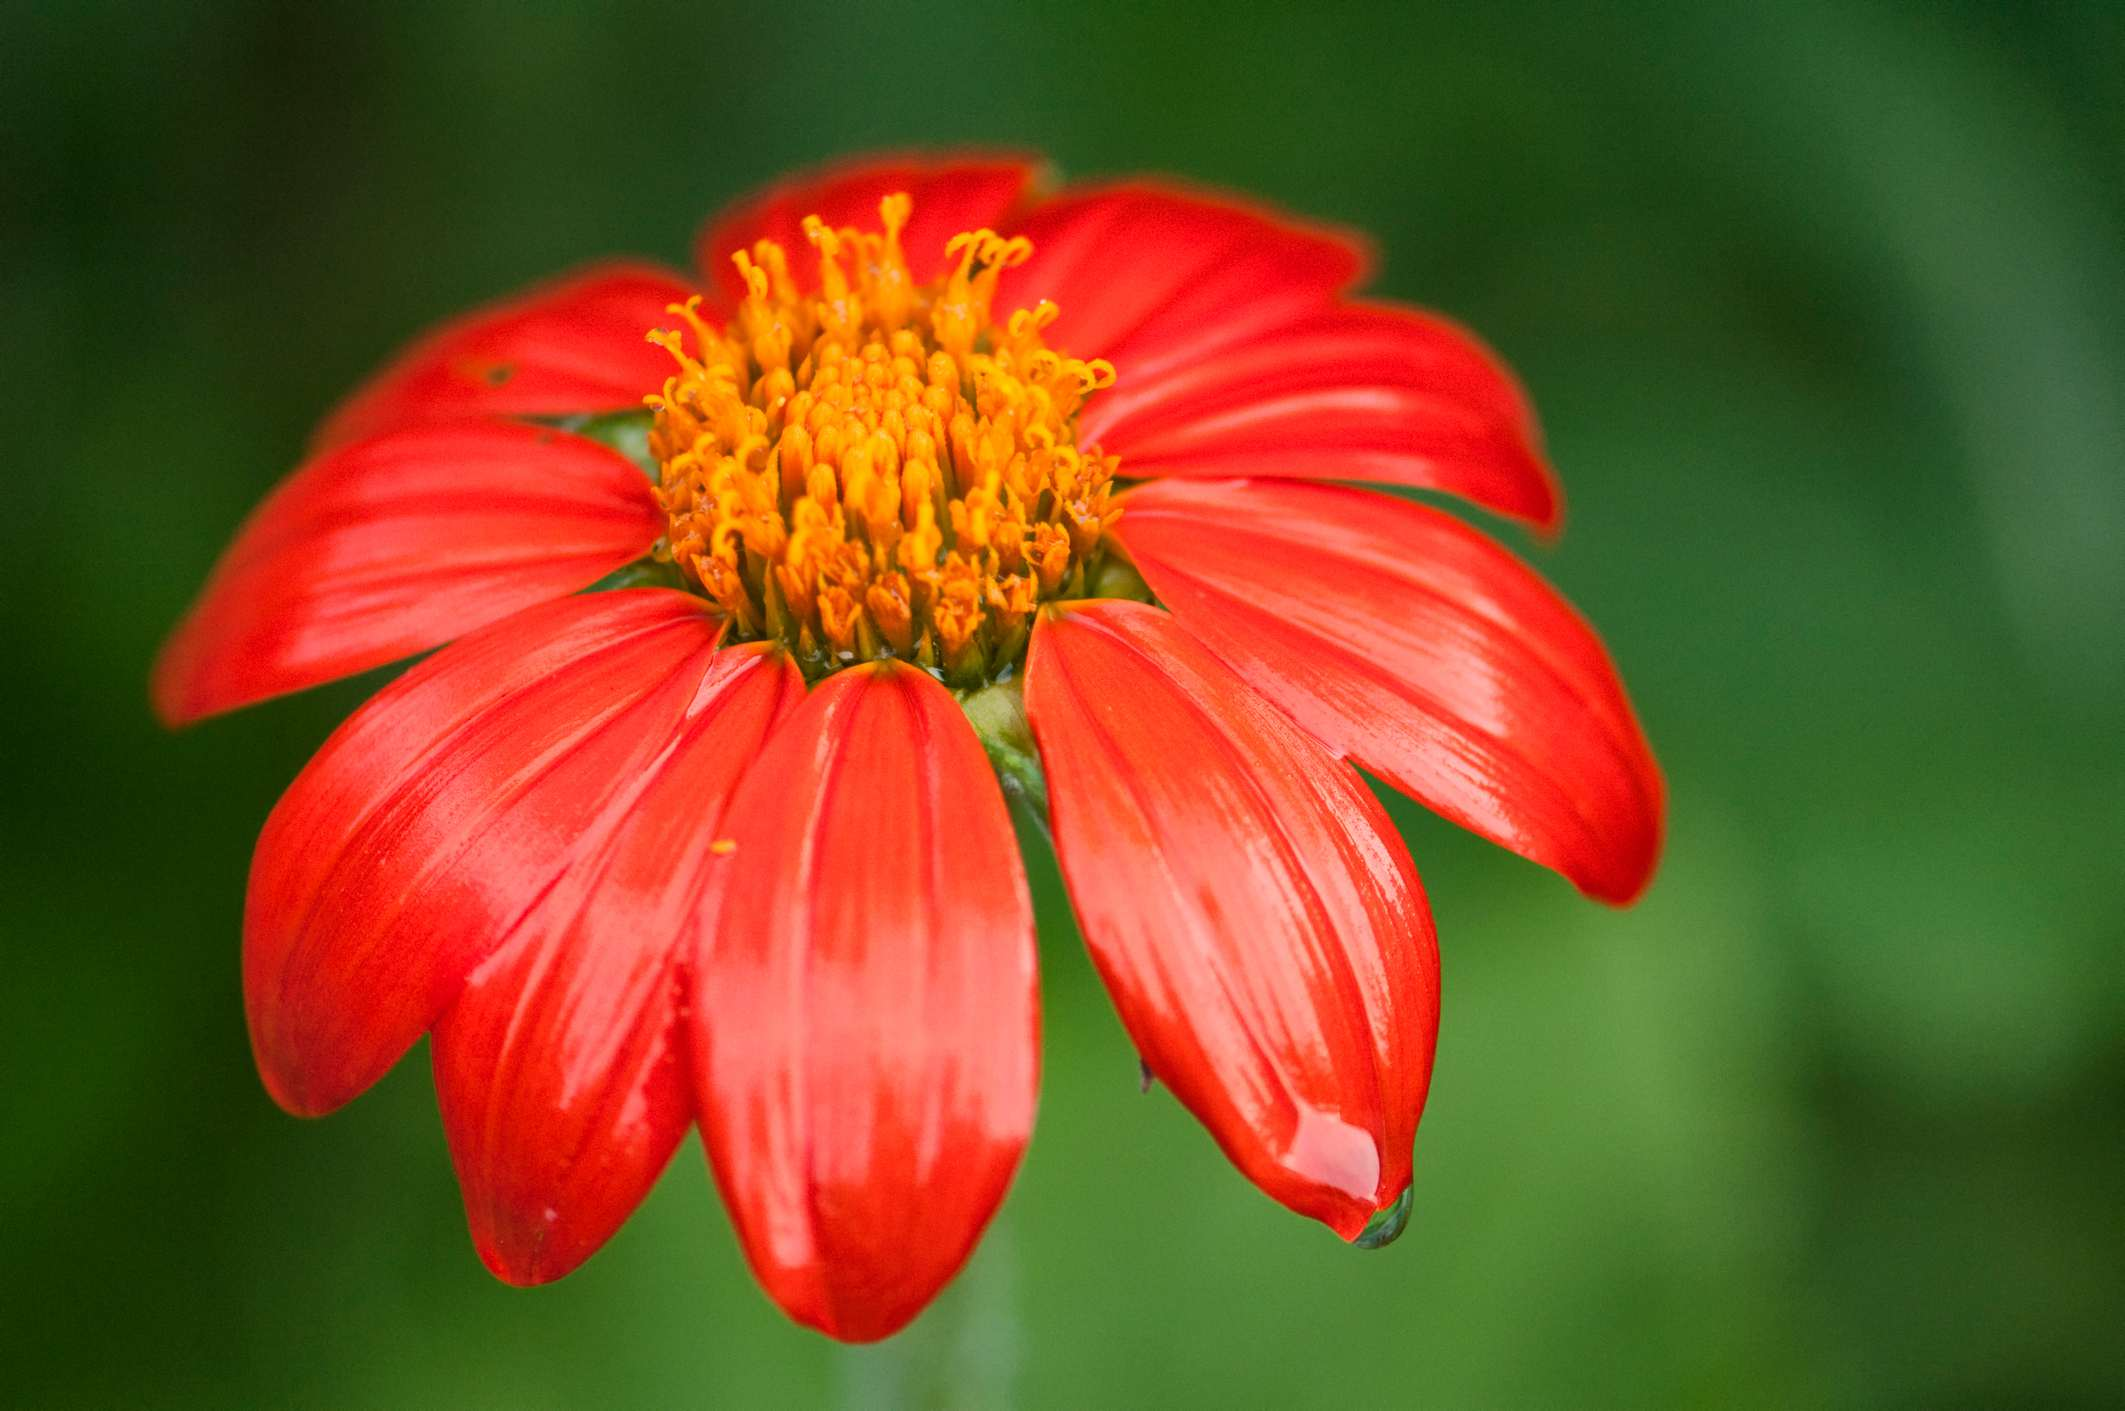 bright orange-red Mexican sunflower